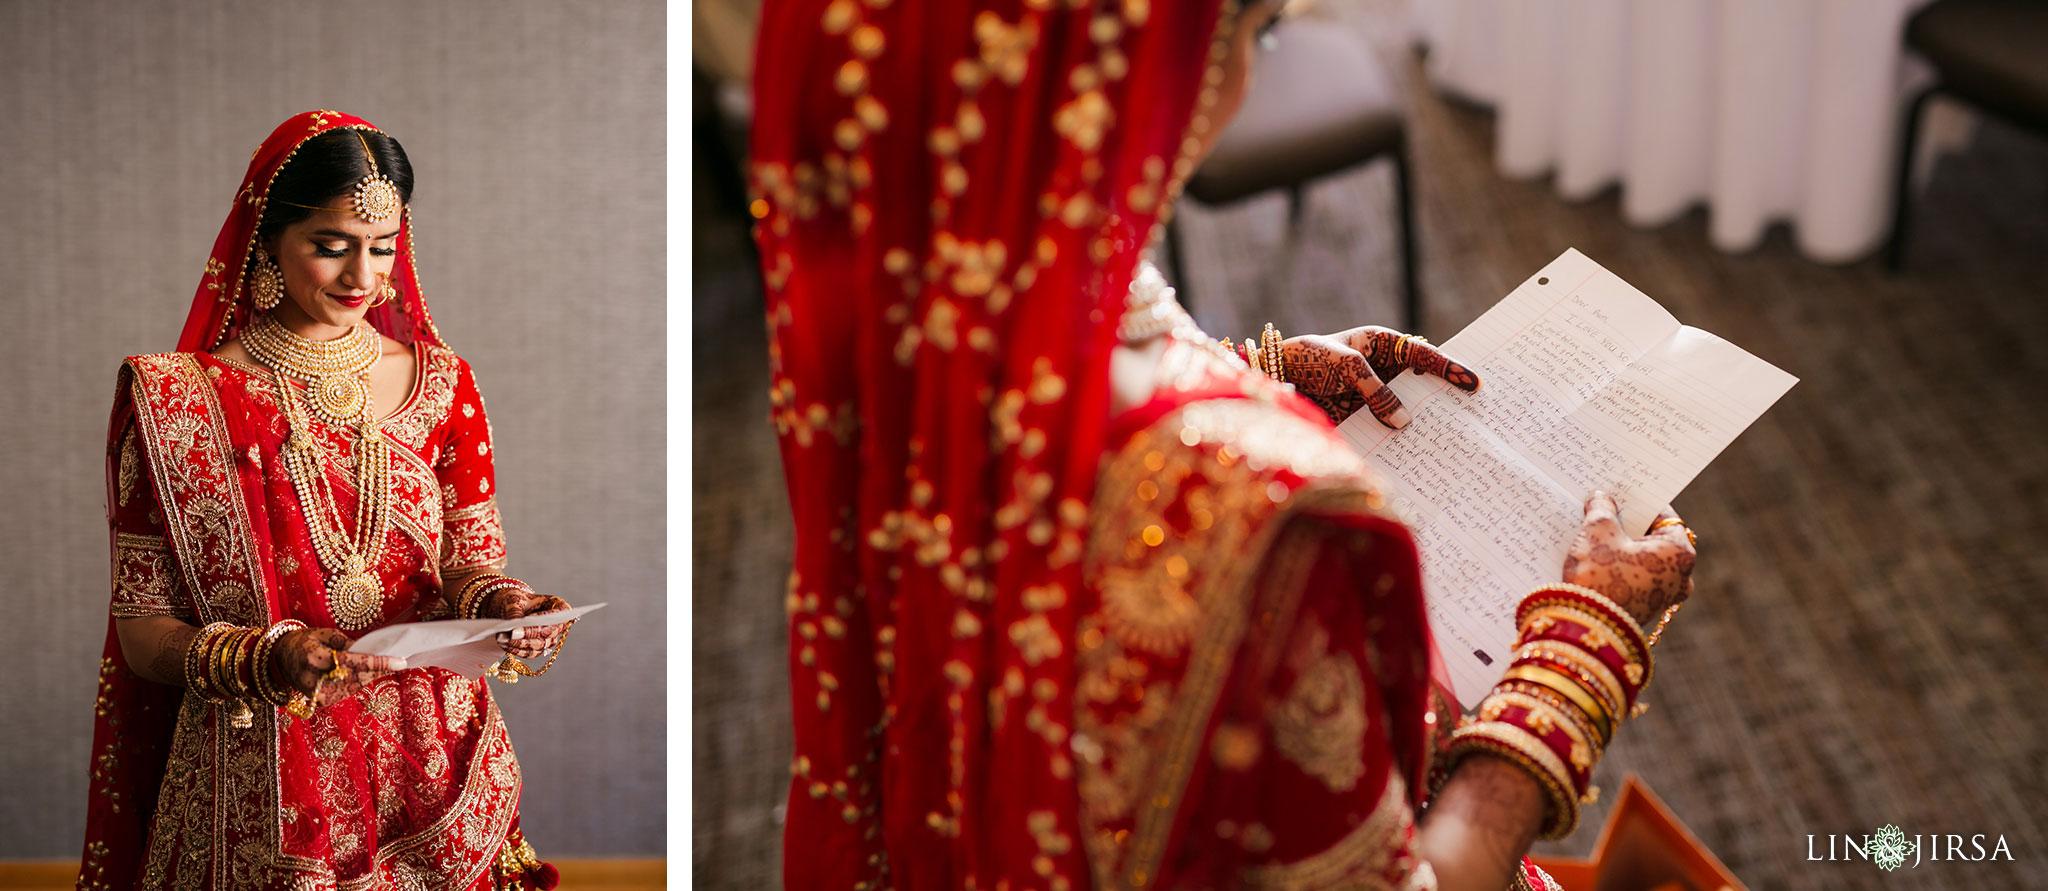 002 san jose marriott indian wedding photography